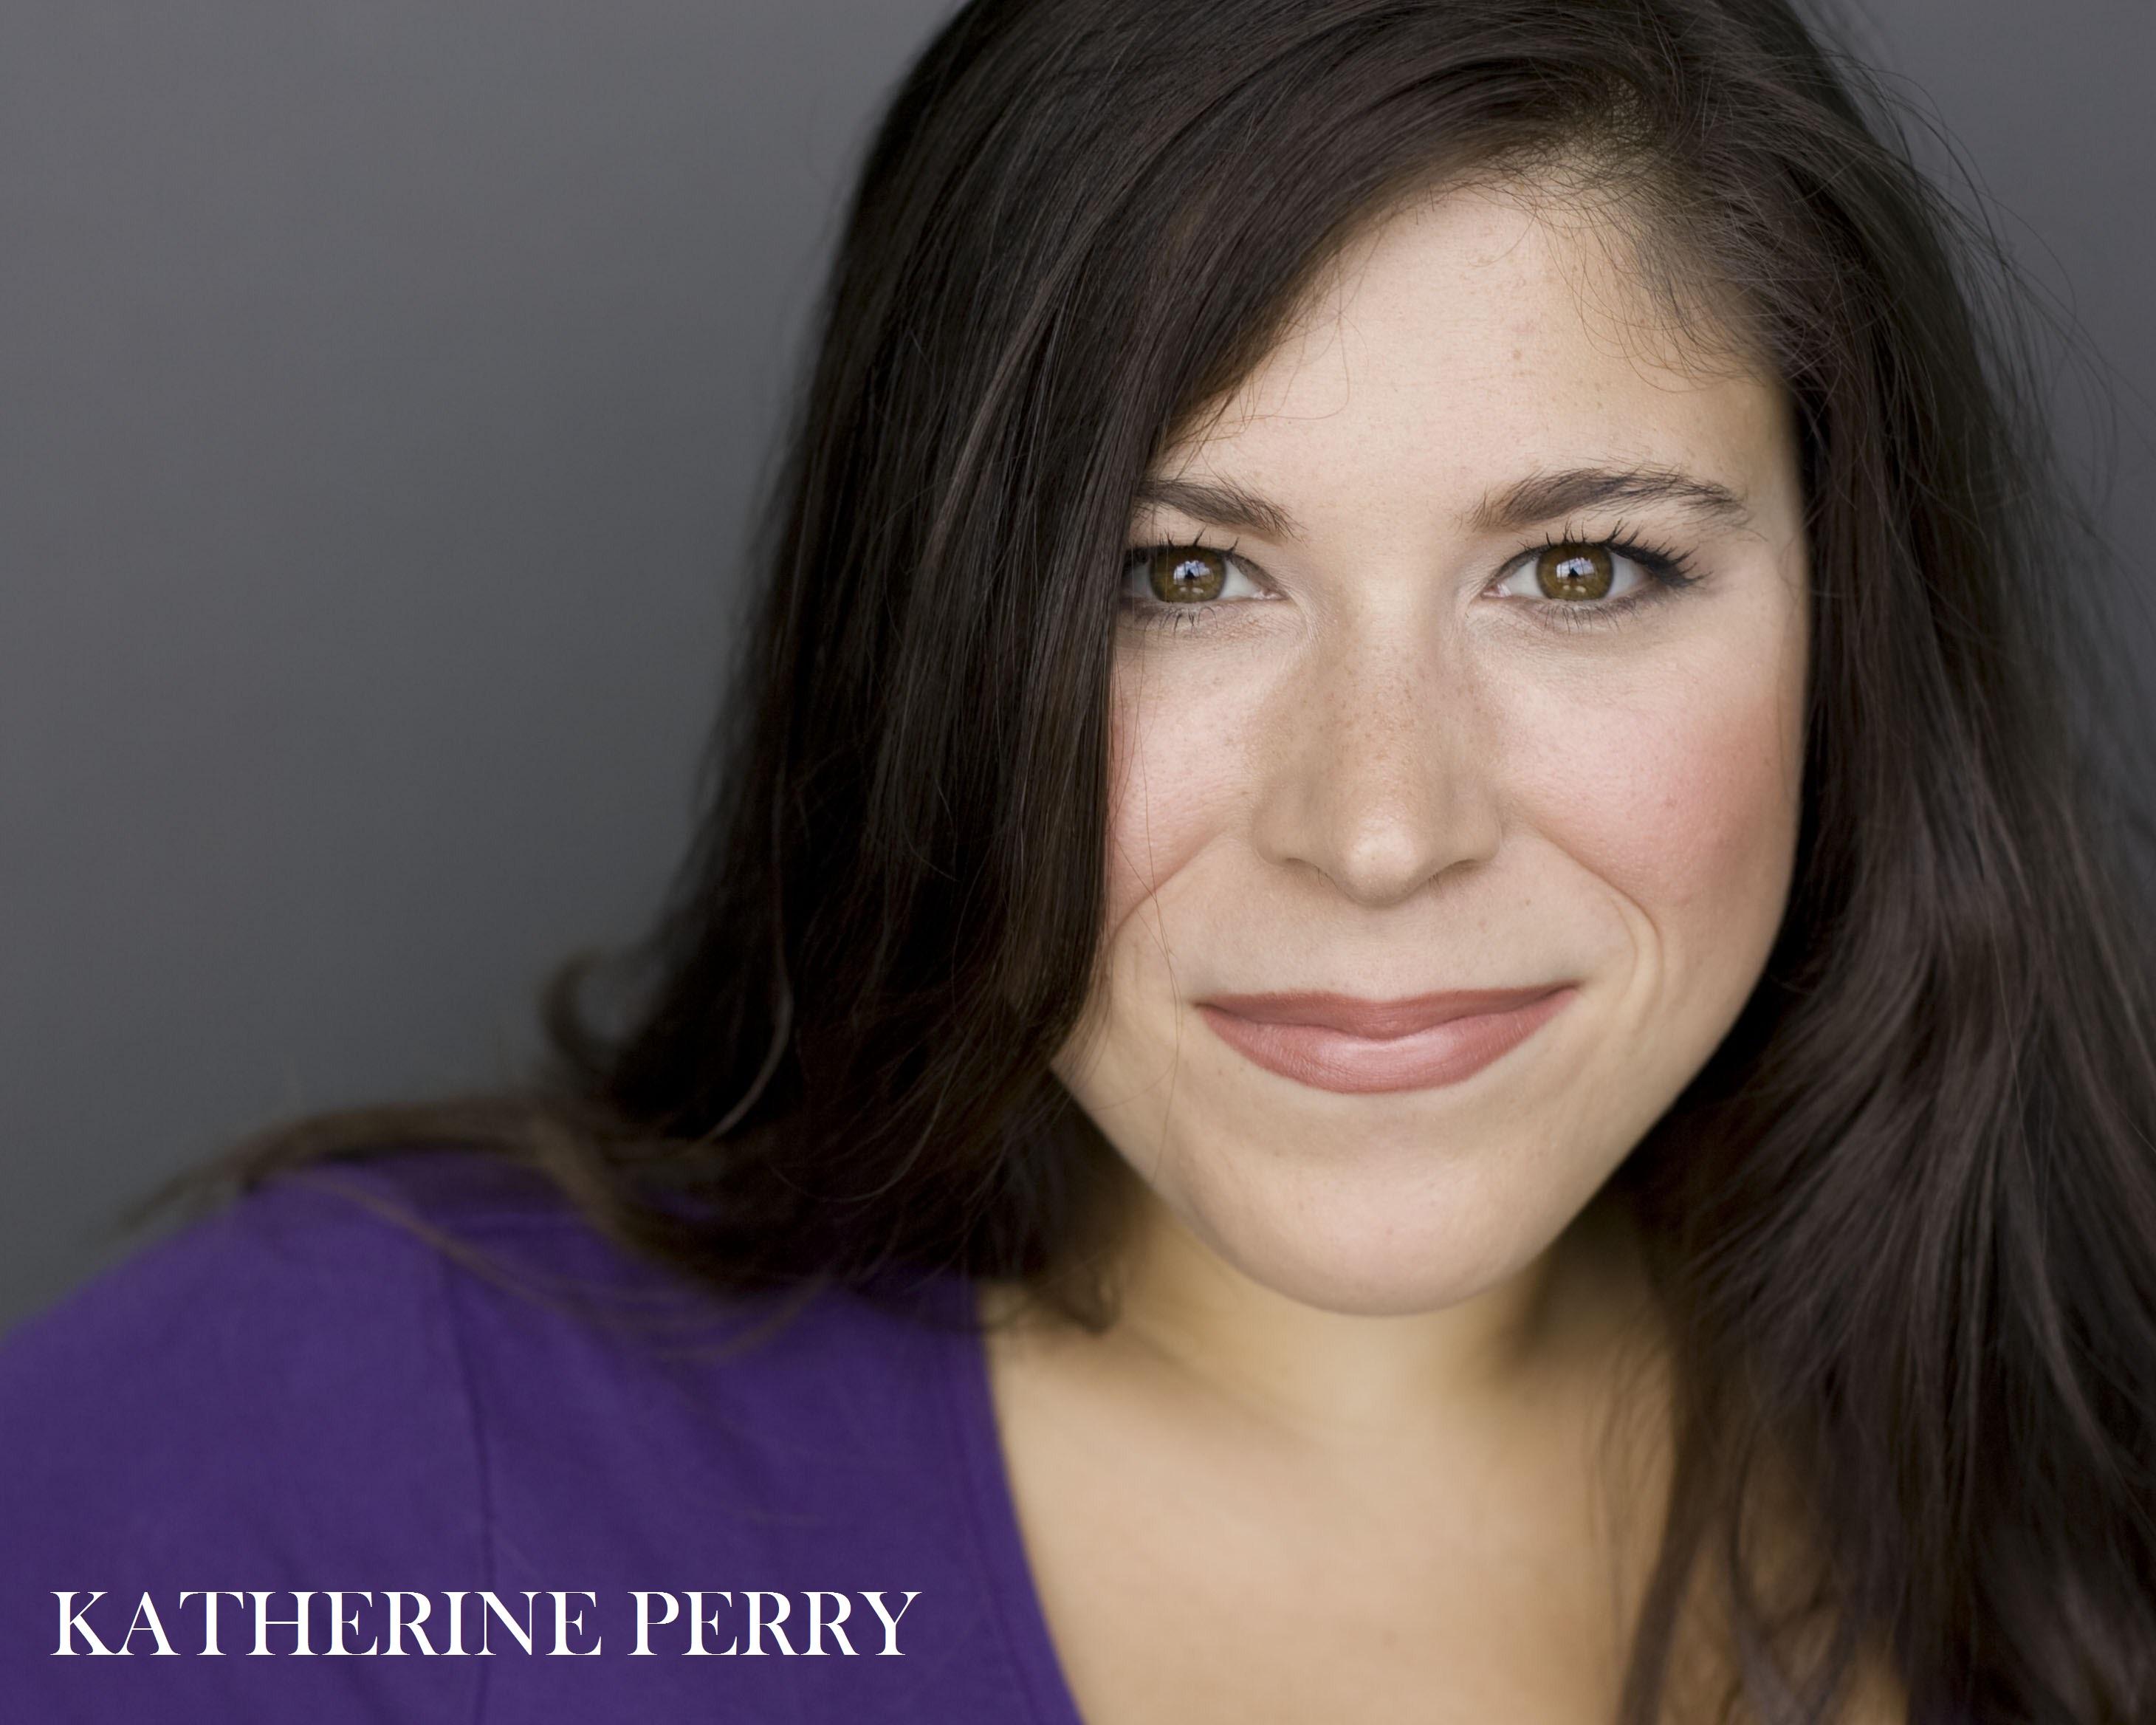 Katherine Perry 1620658186391